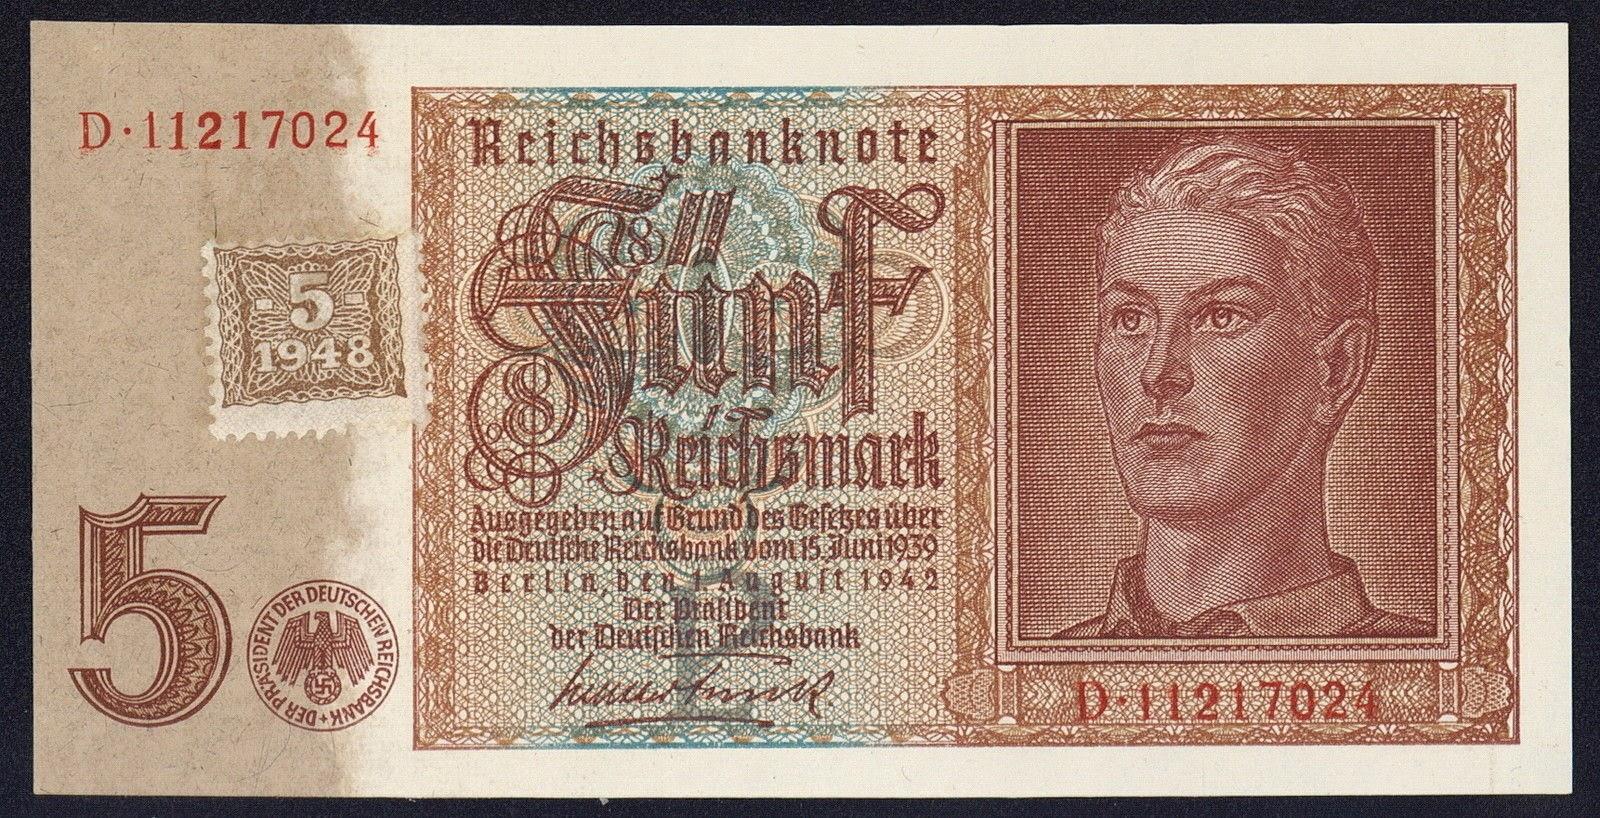 Germany 5 reichsmark banknote 1942 hitler youth 1948 ddr stamp germany 5 reichsmark banknote 1942 hitler youth 1948 ddr stamp buycottarizona